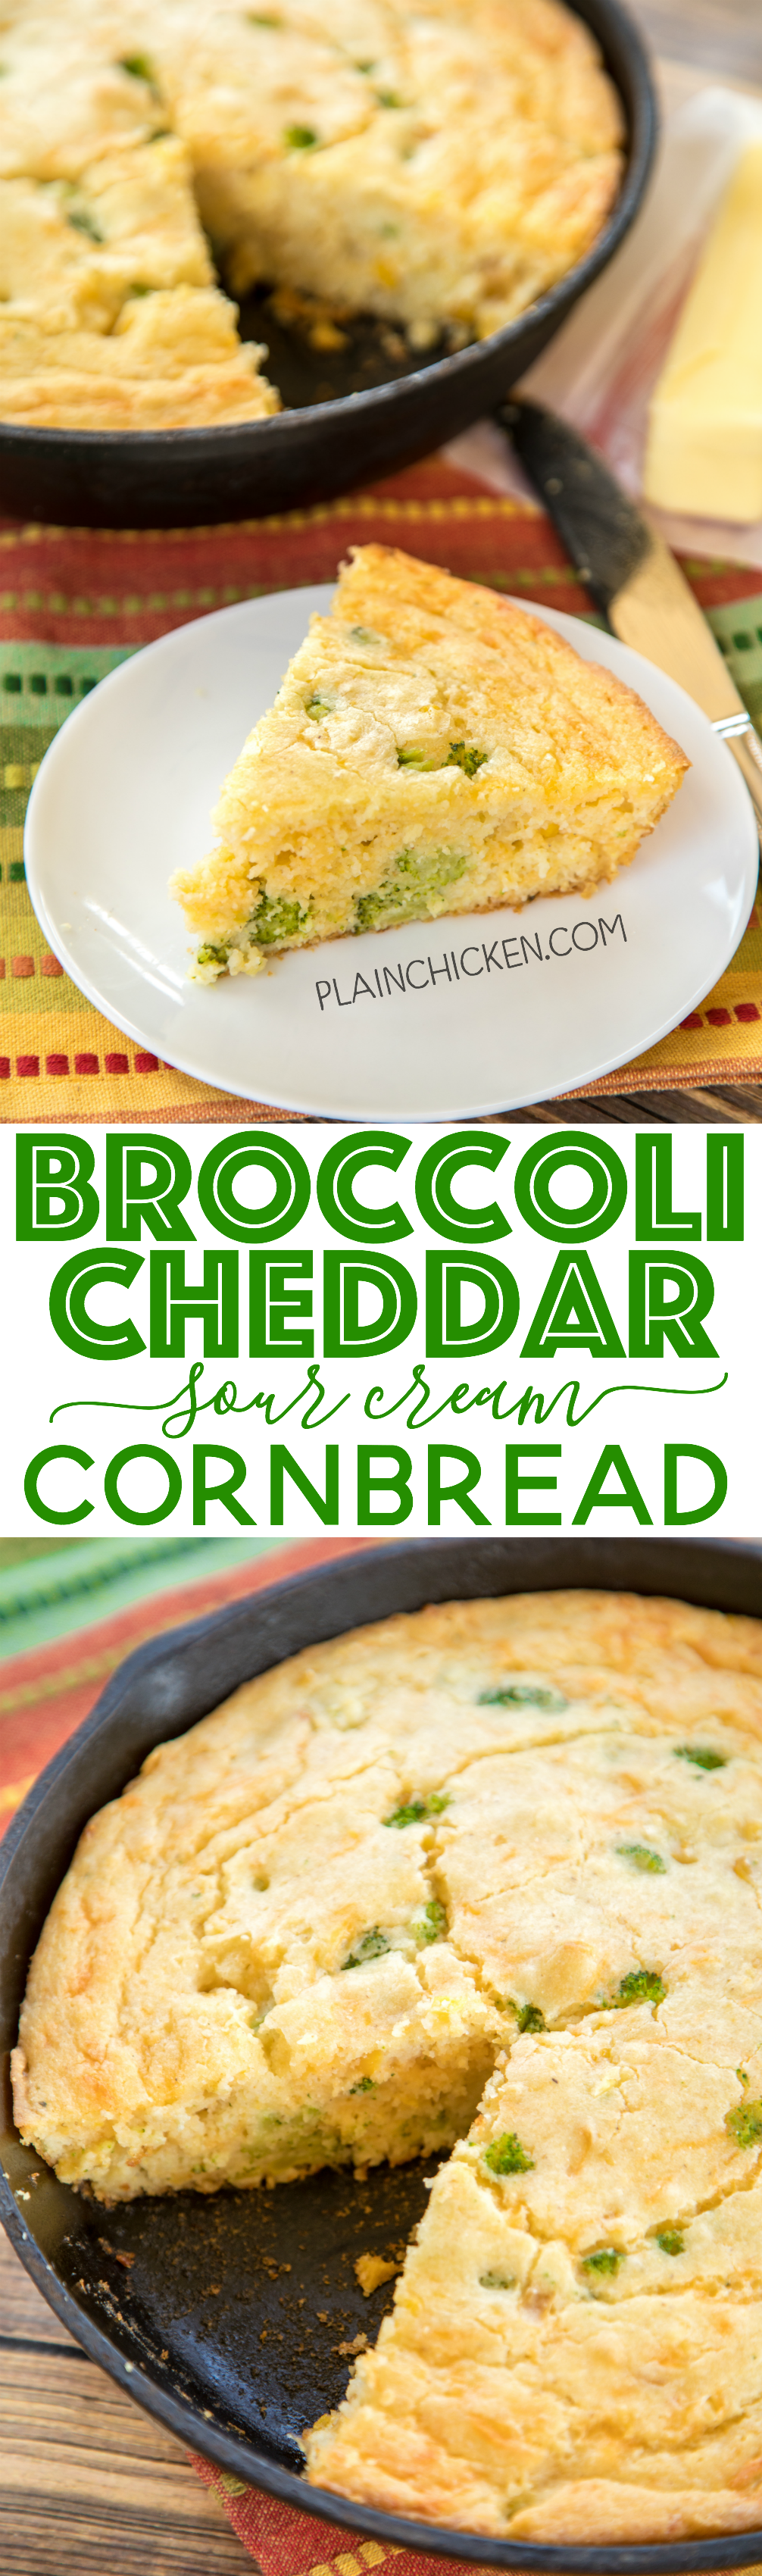 broccoli cheddar sour cream cornbread recipe only 7 ingredients rh pinterest com